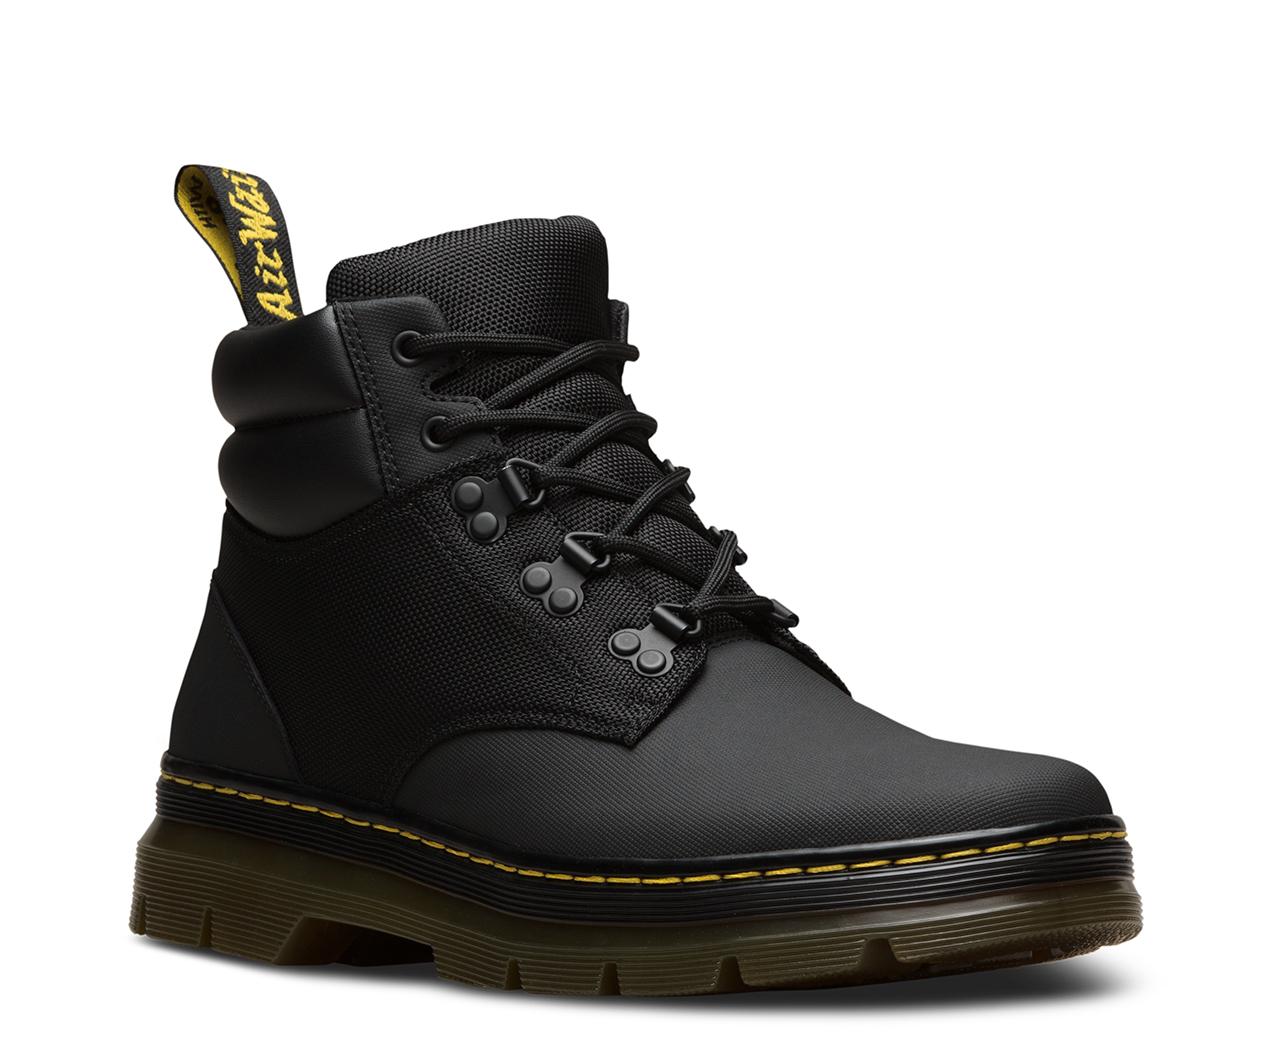 Rakim Hiking 5-Eye Boots - Black Dr. Martens YT8dT